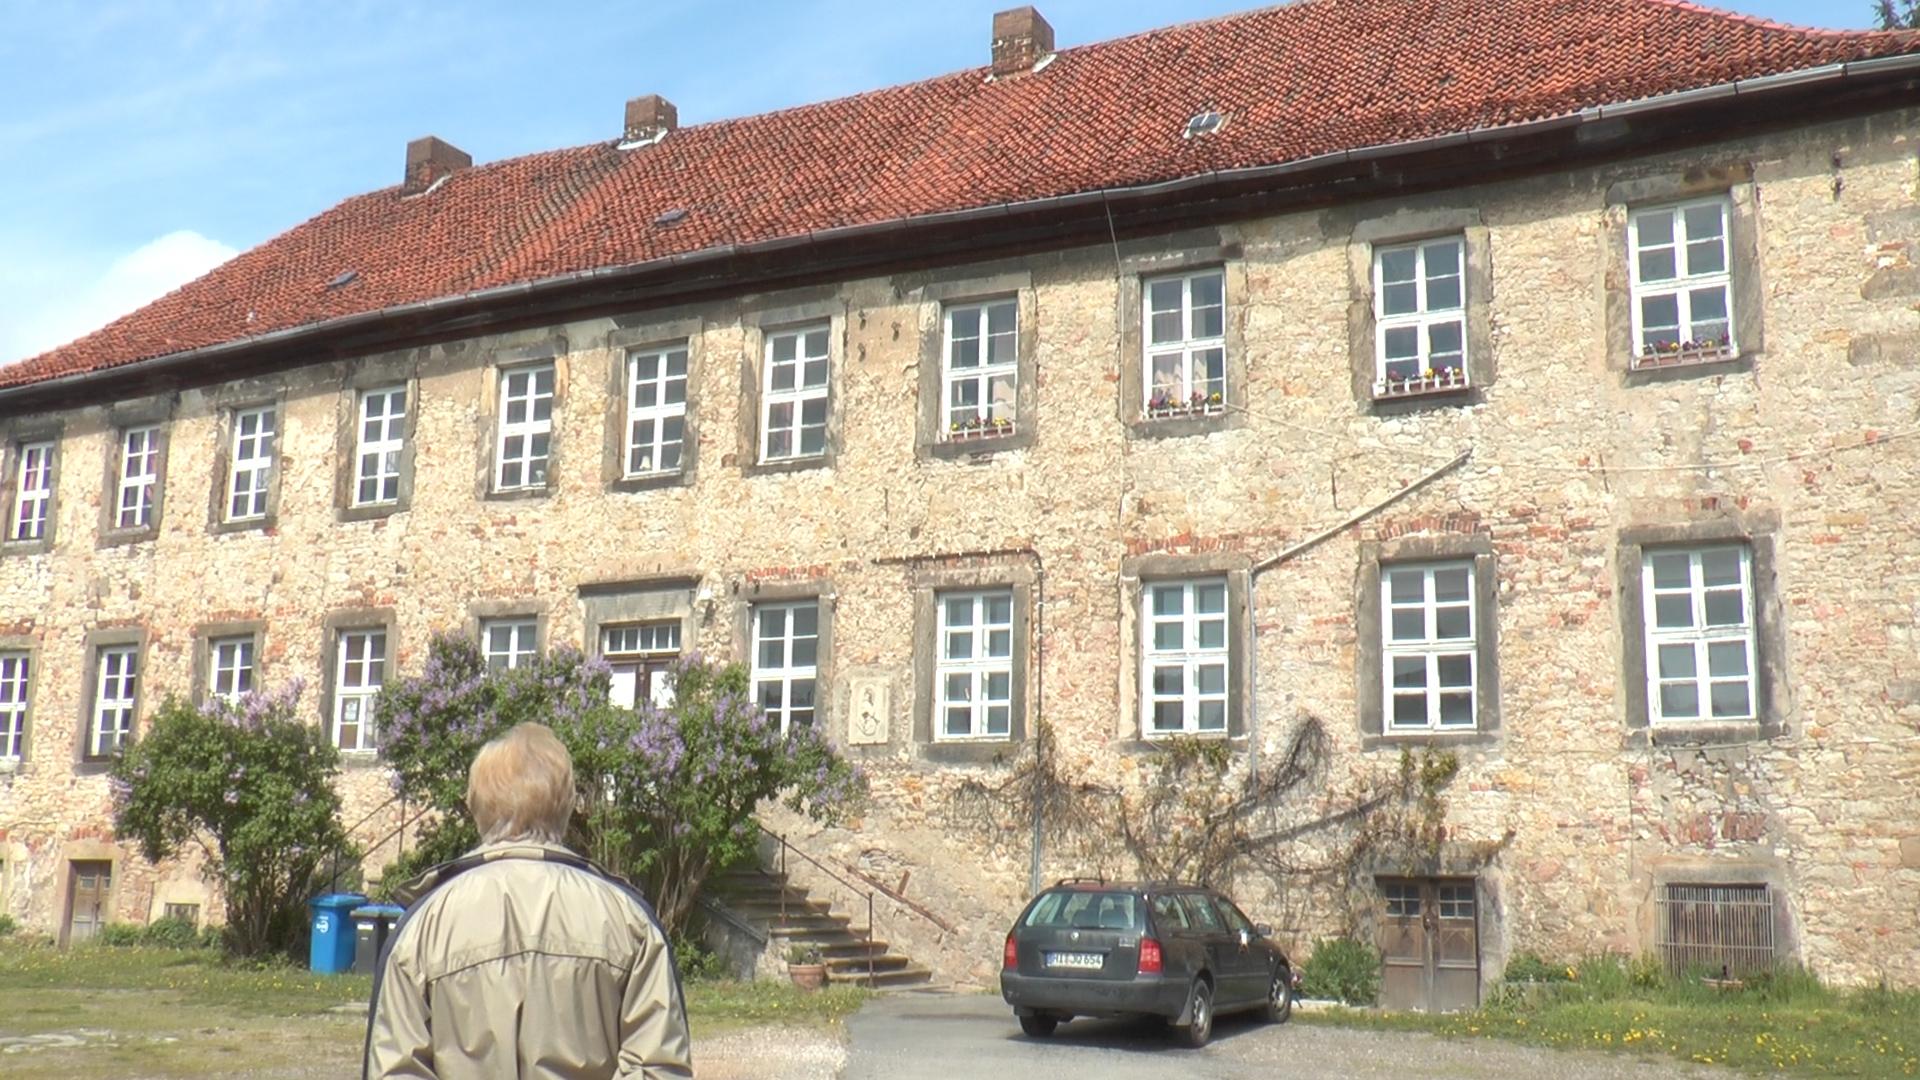 Bockhof